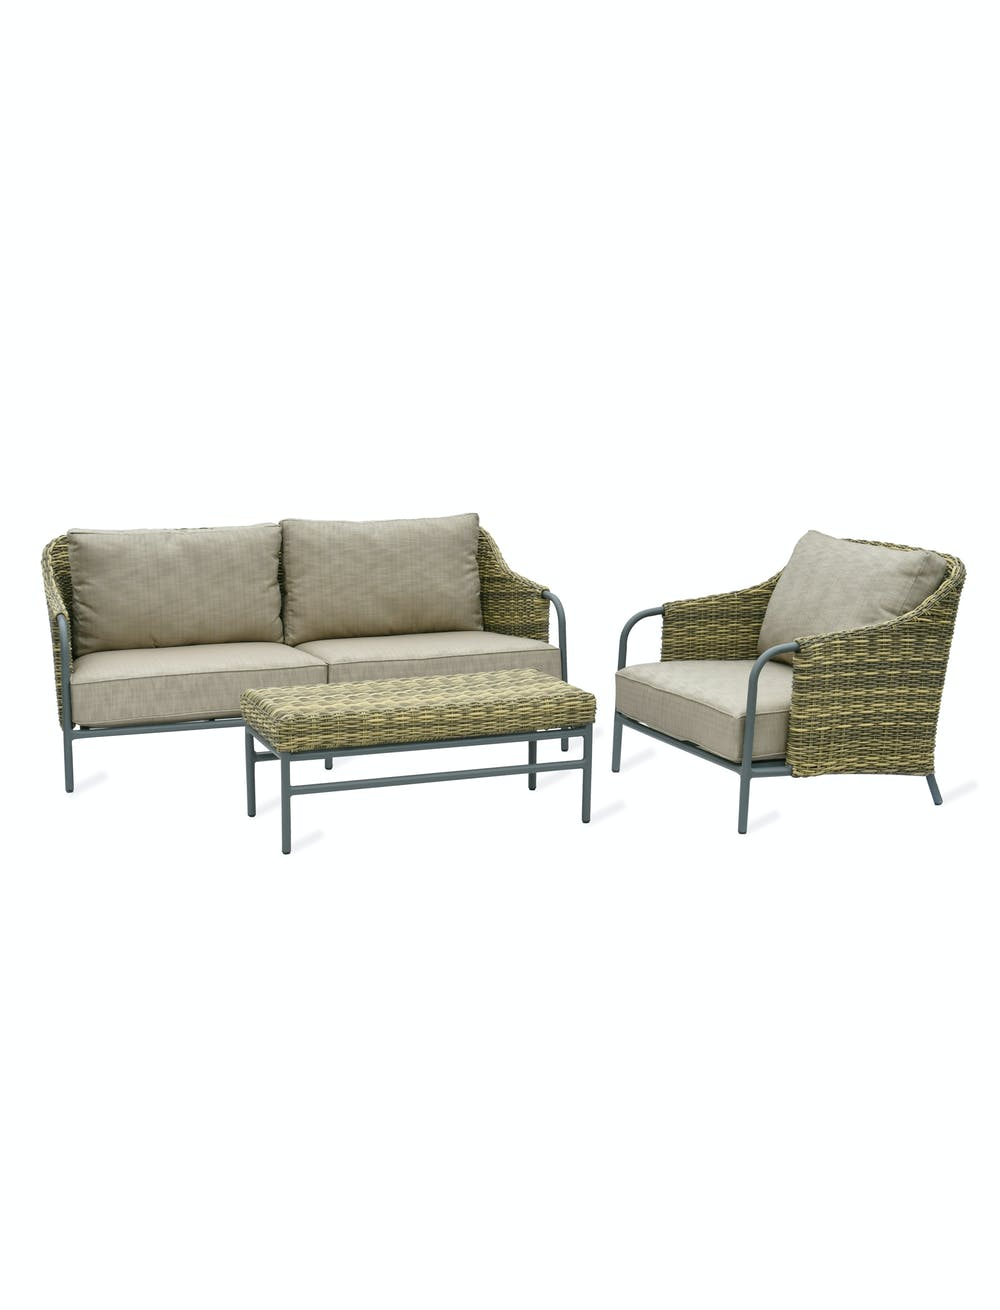 Heyshott Sofa Set